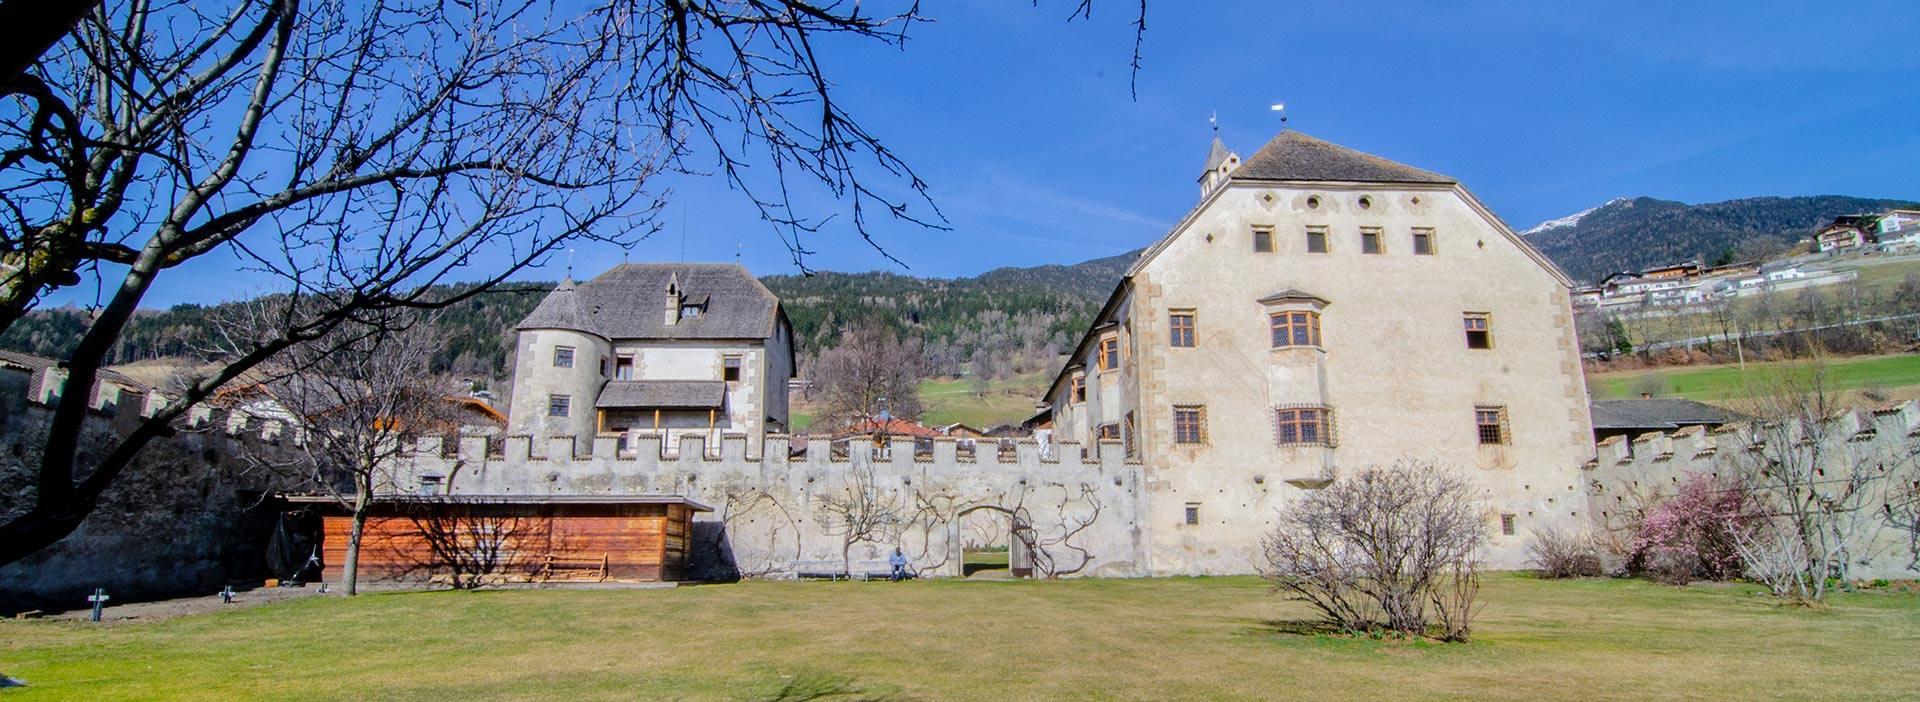 Schloss Velthurns